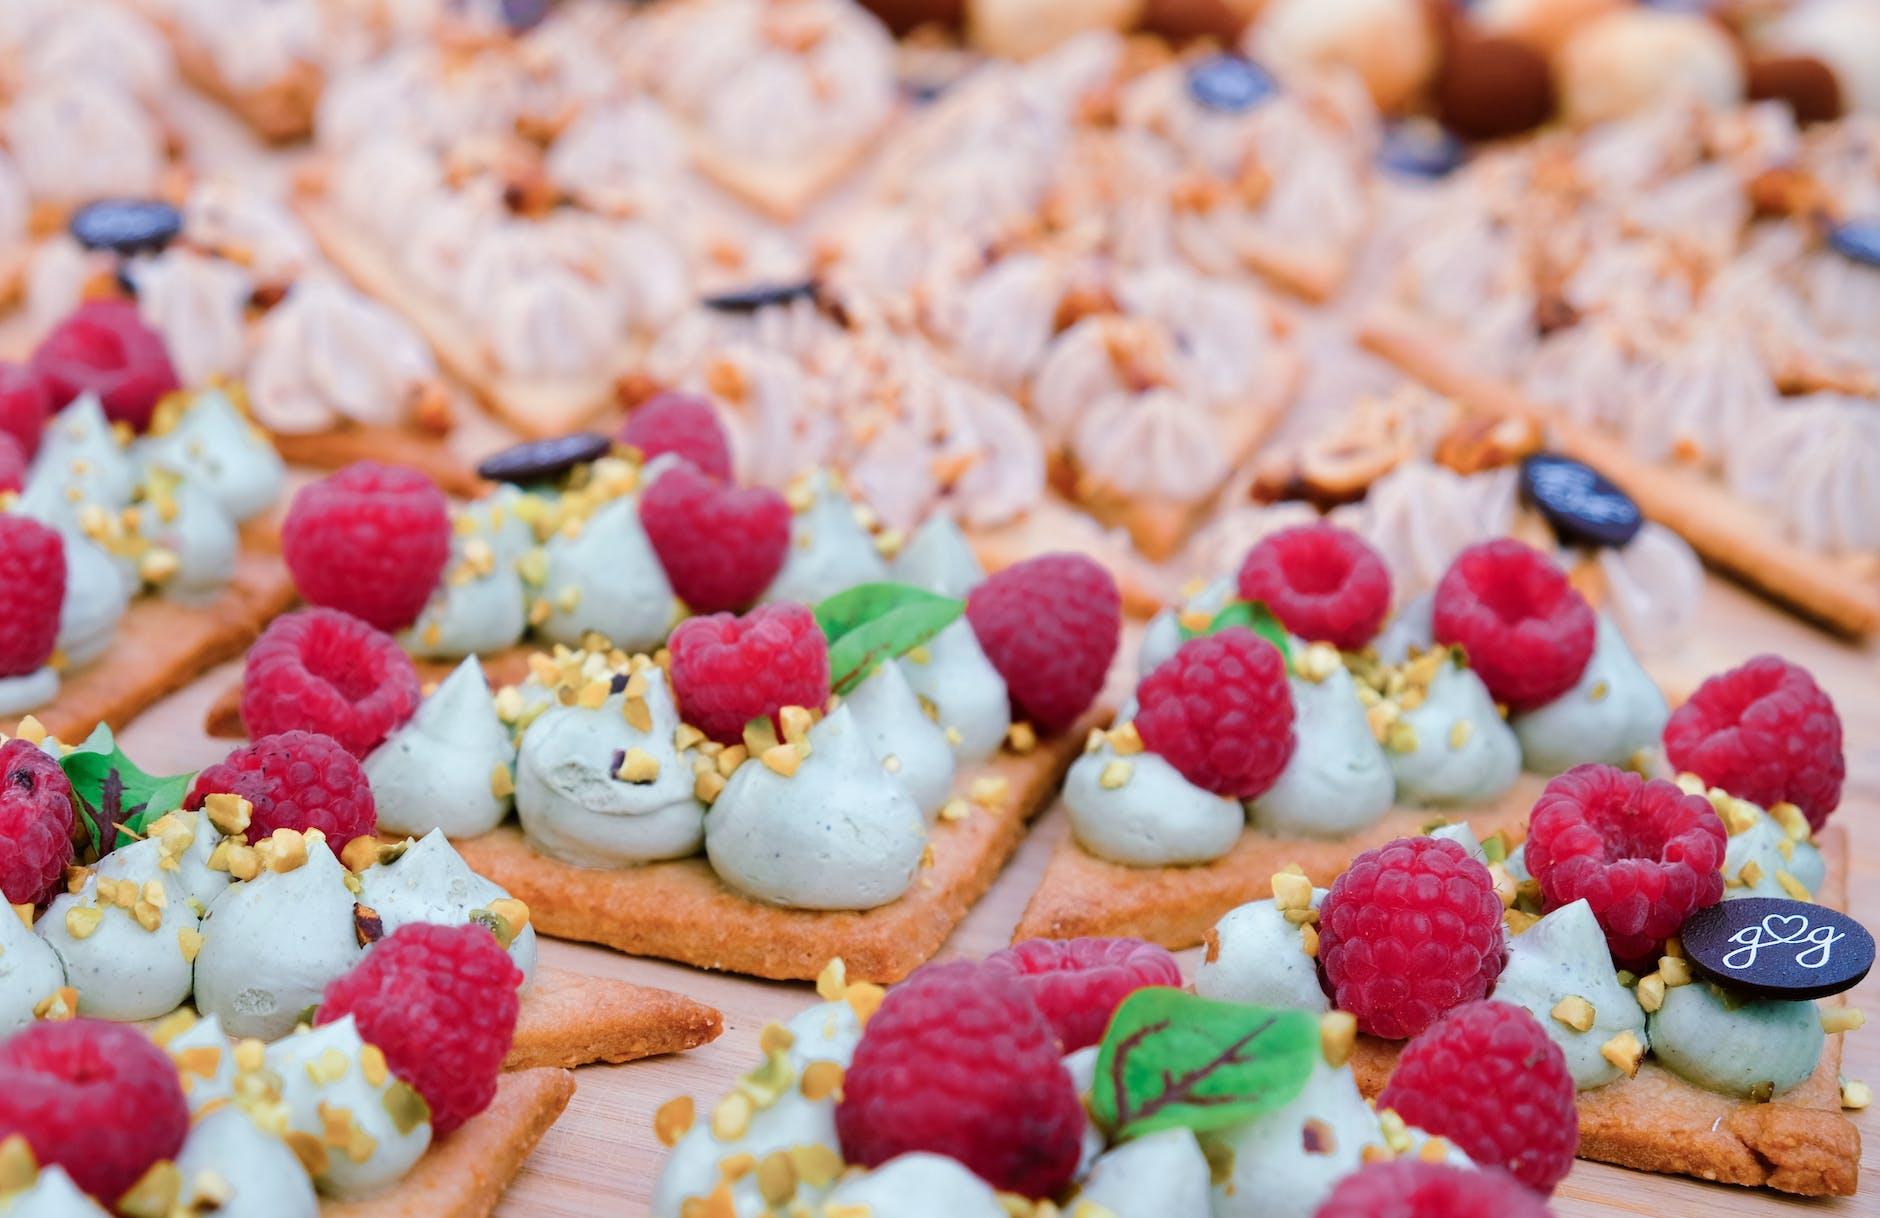 Sugarfree Sweets: A Key To Happiness